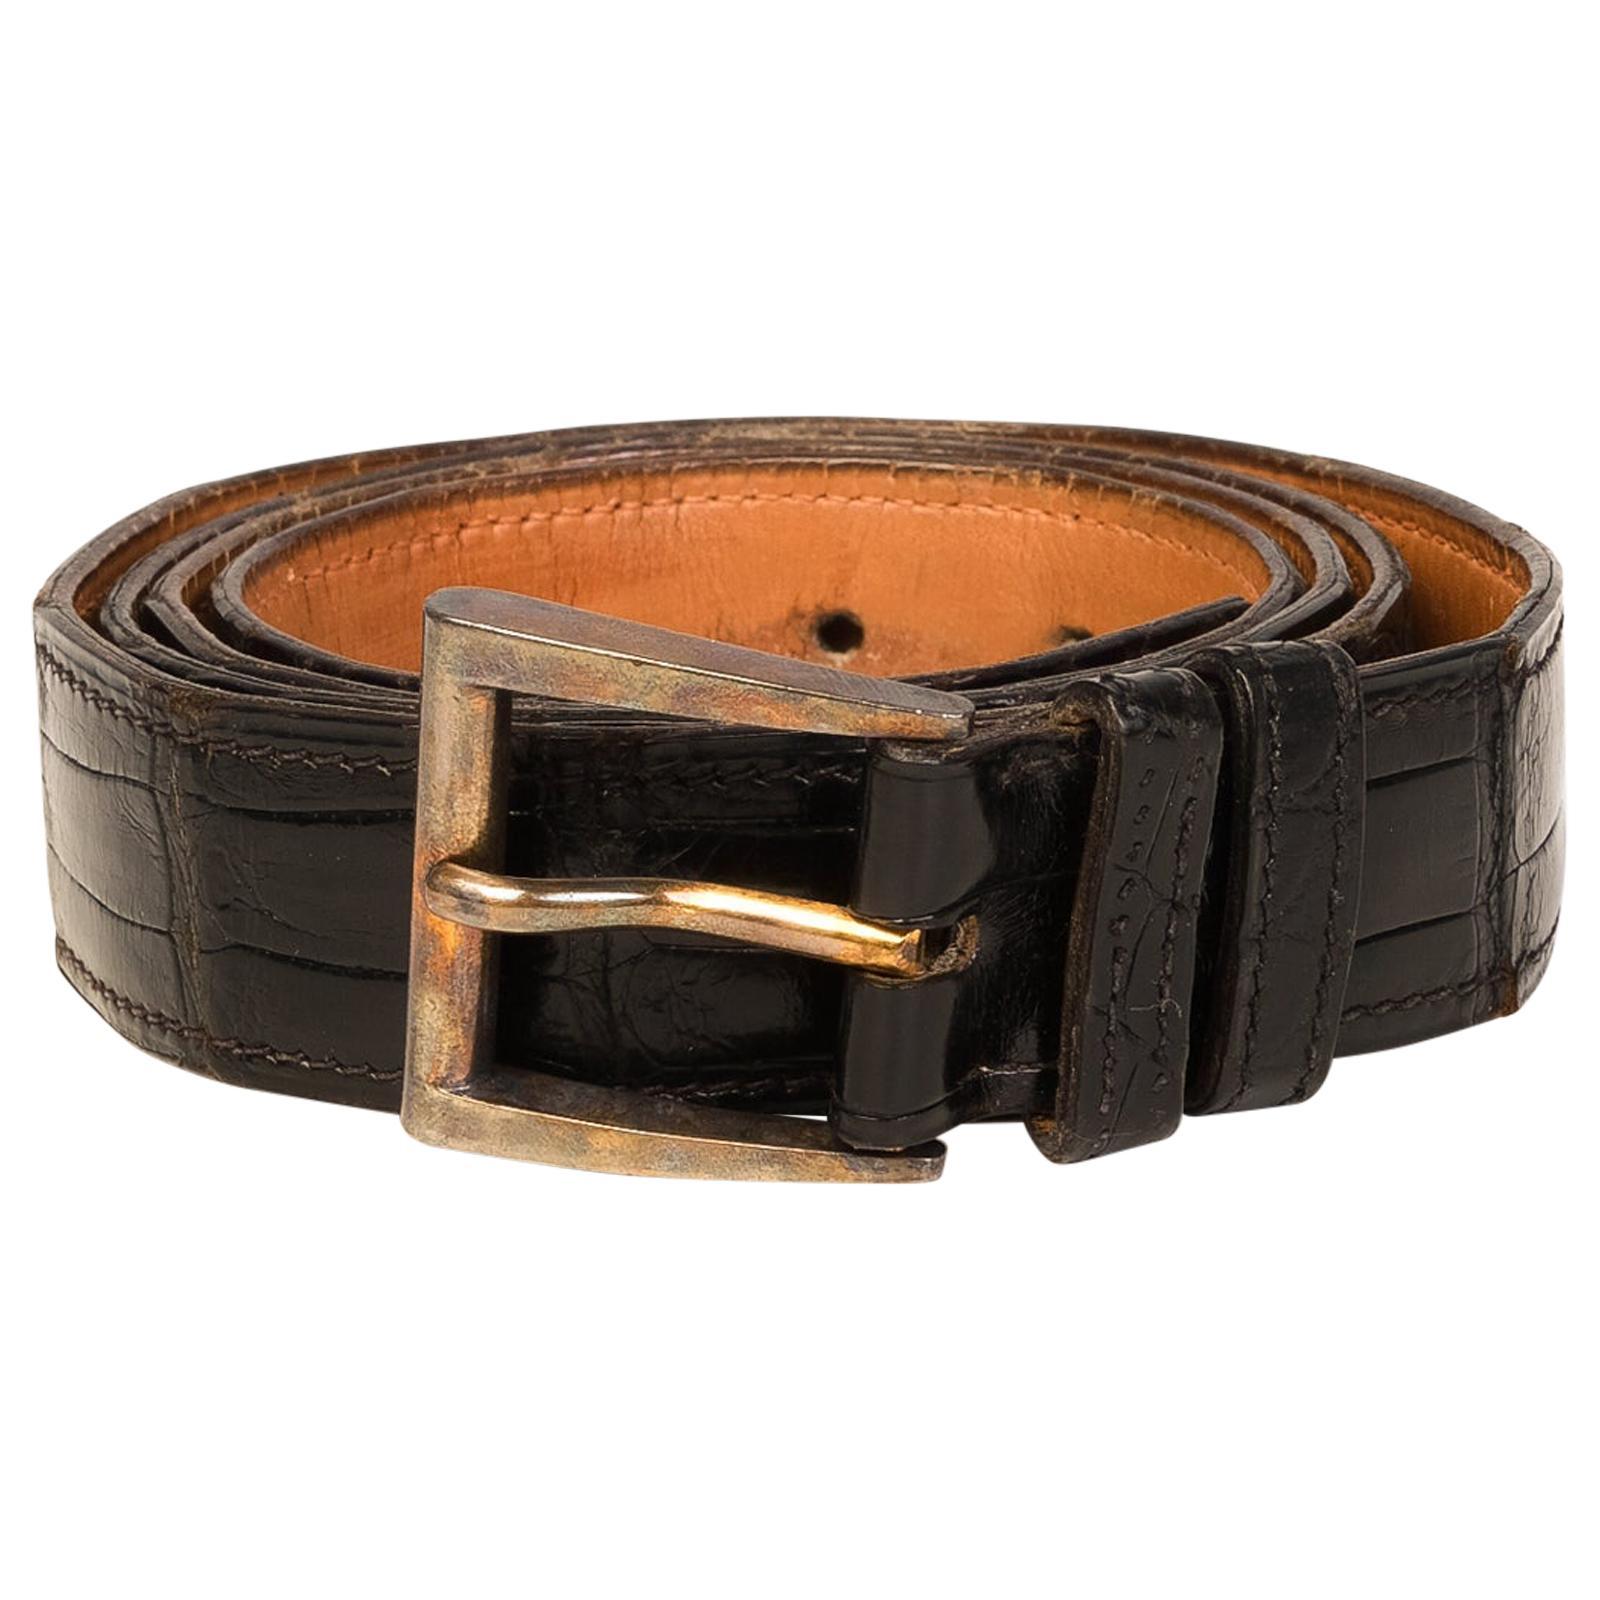 Hermes Vintage Crocodile Belt